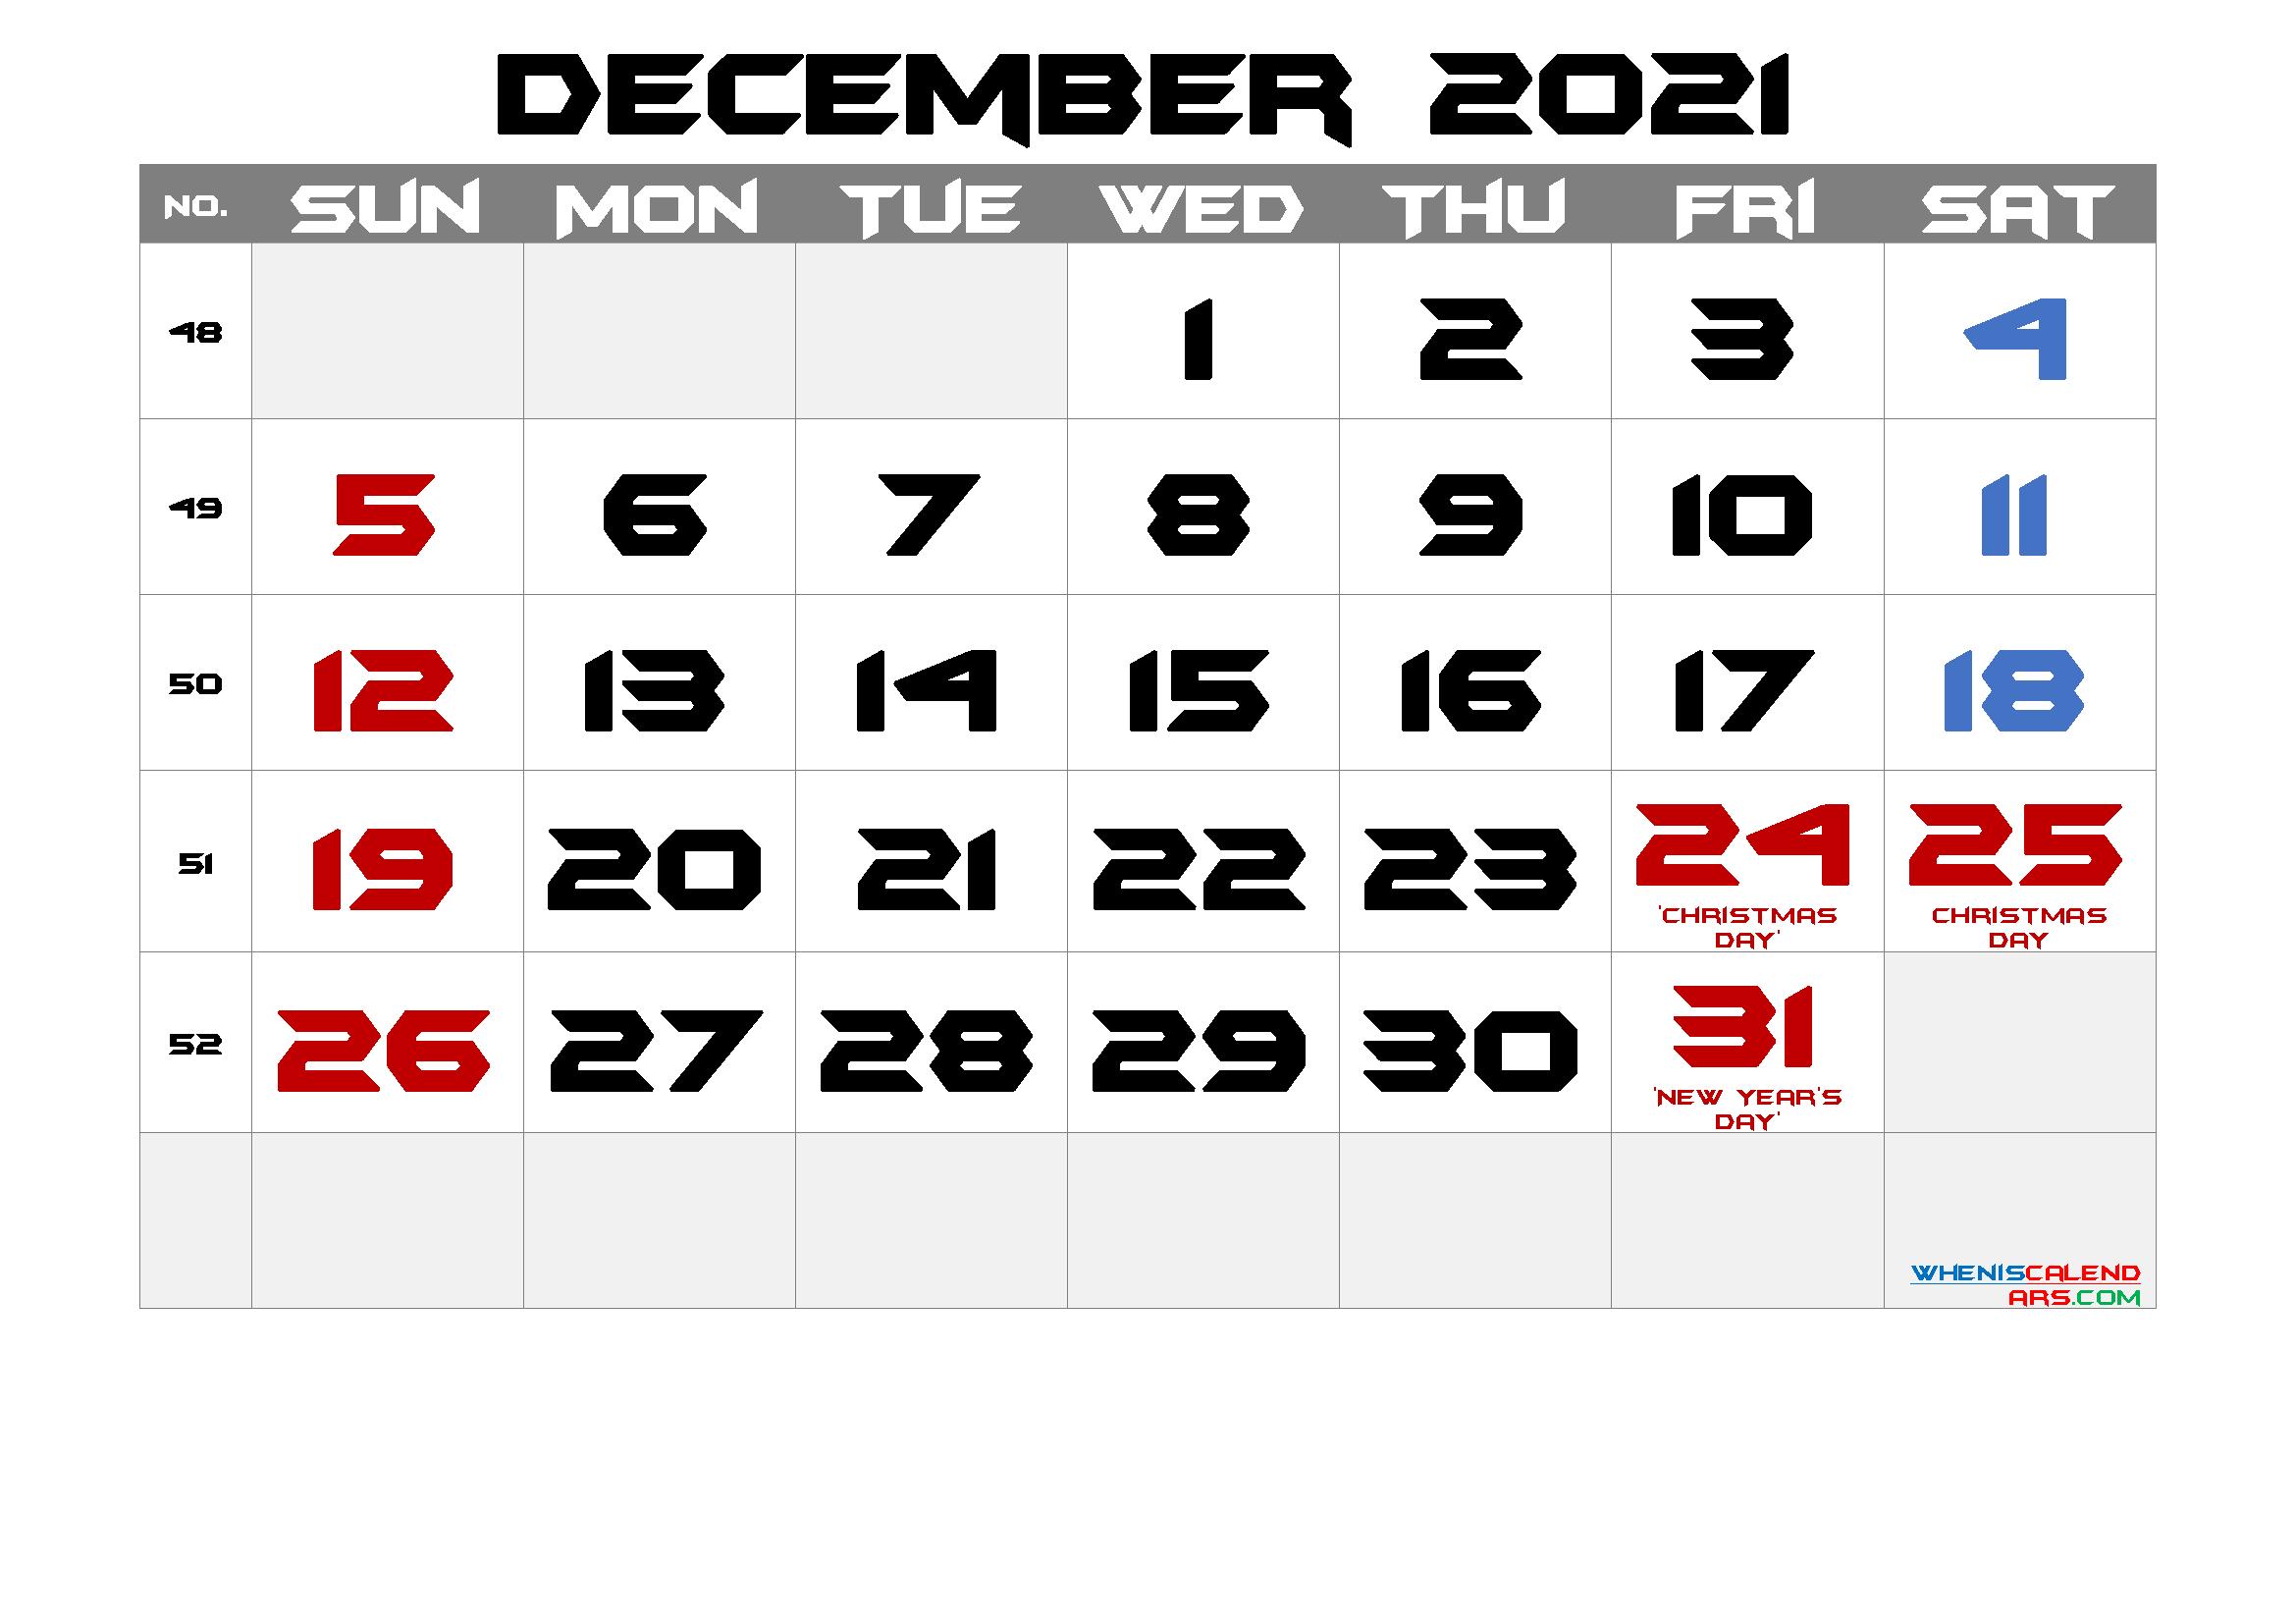 December 2021 Free Printable Calendar with Holidays